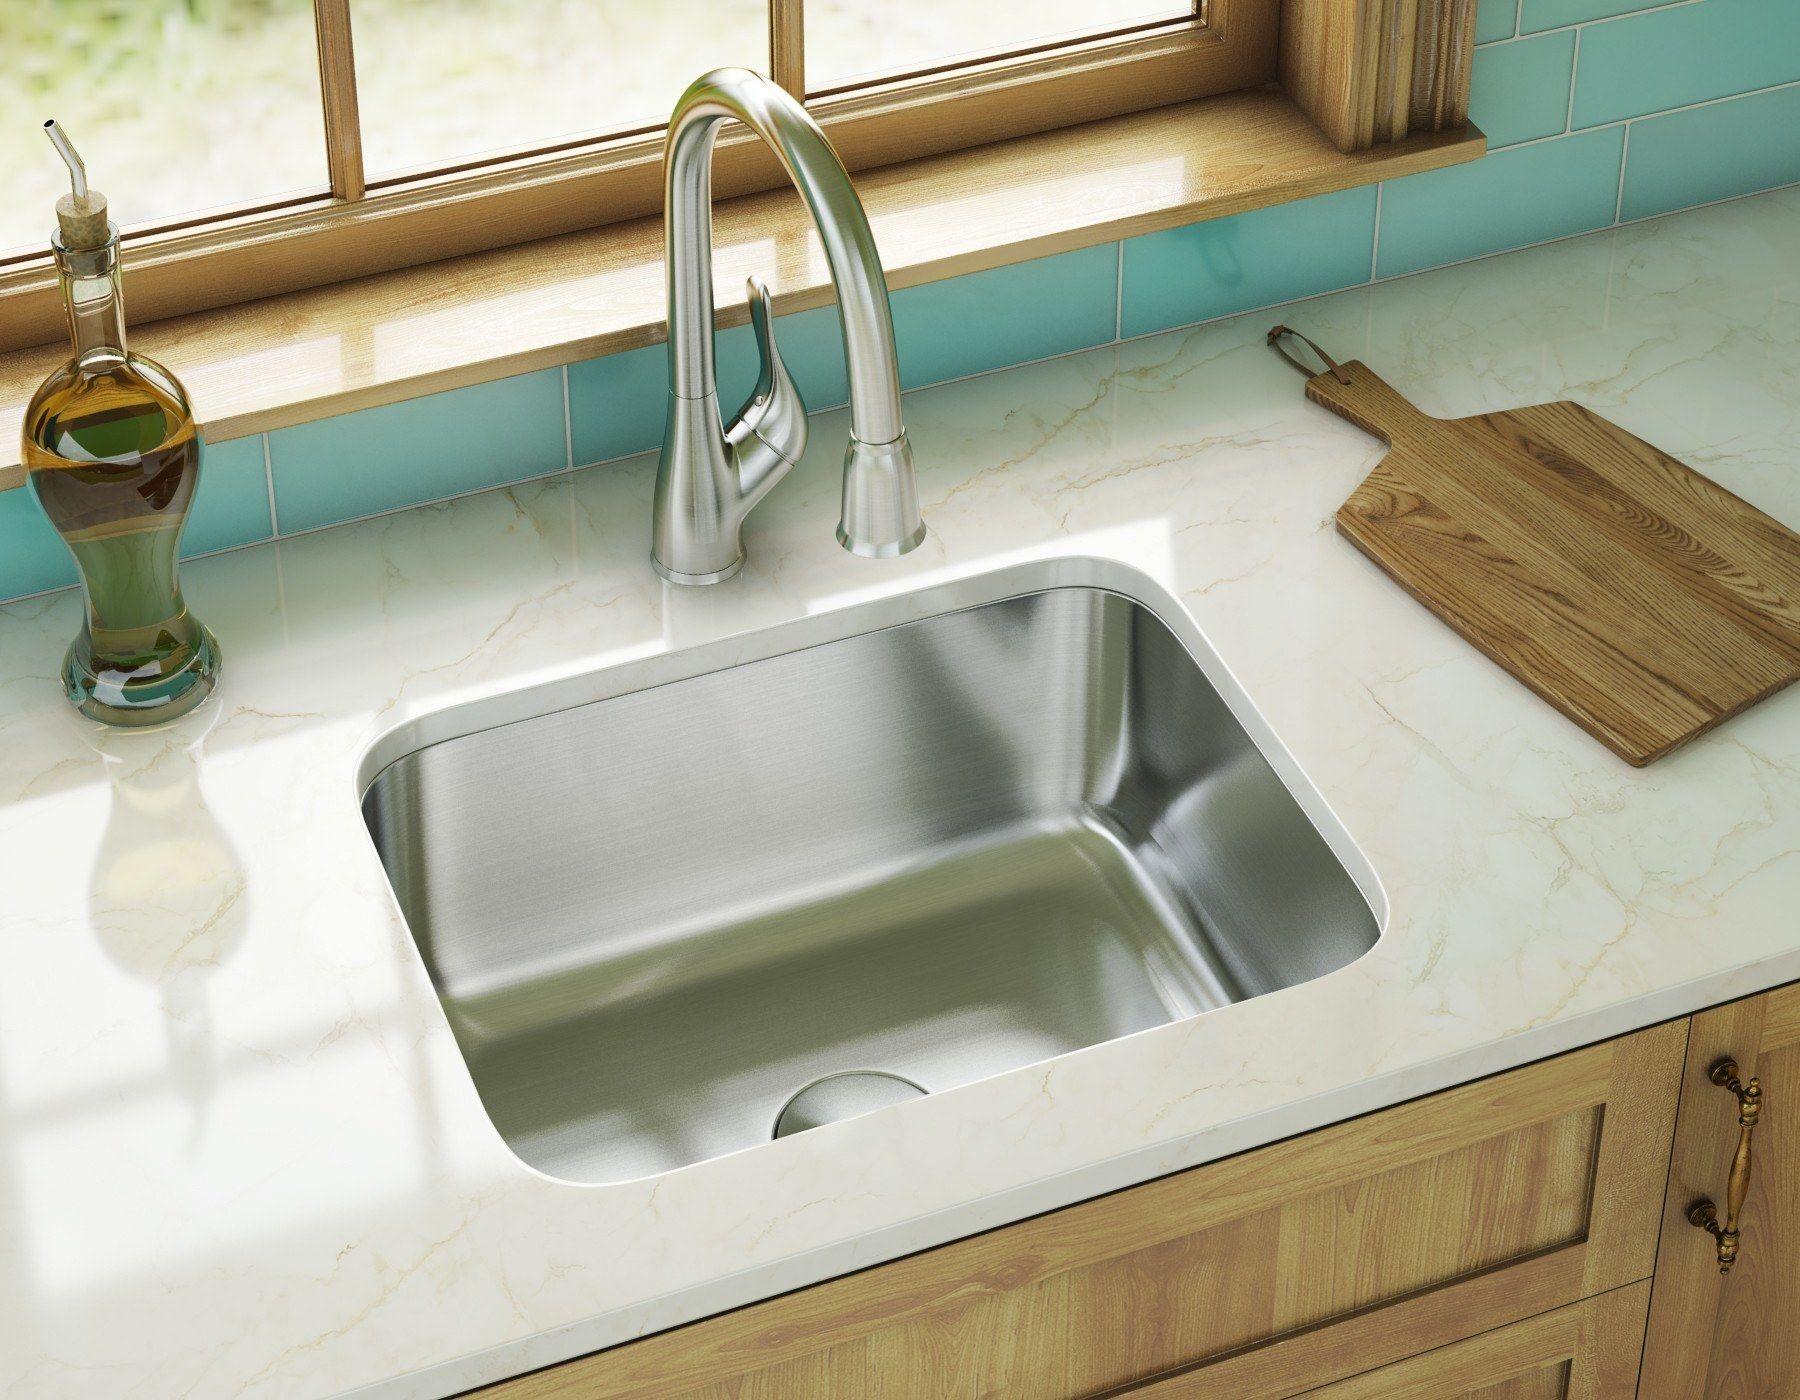 stainless steel sink series   model  ksn 2318 16 undermount single bowl 16 gauge stainless steel kitchen sink under counter installation no faucet u2026 stainless steel sink series   model  ksn 2318 16 undermount single      rh   it pinterest com